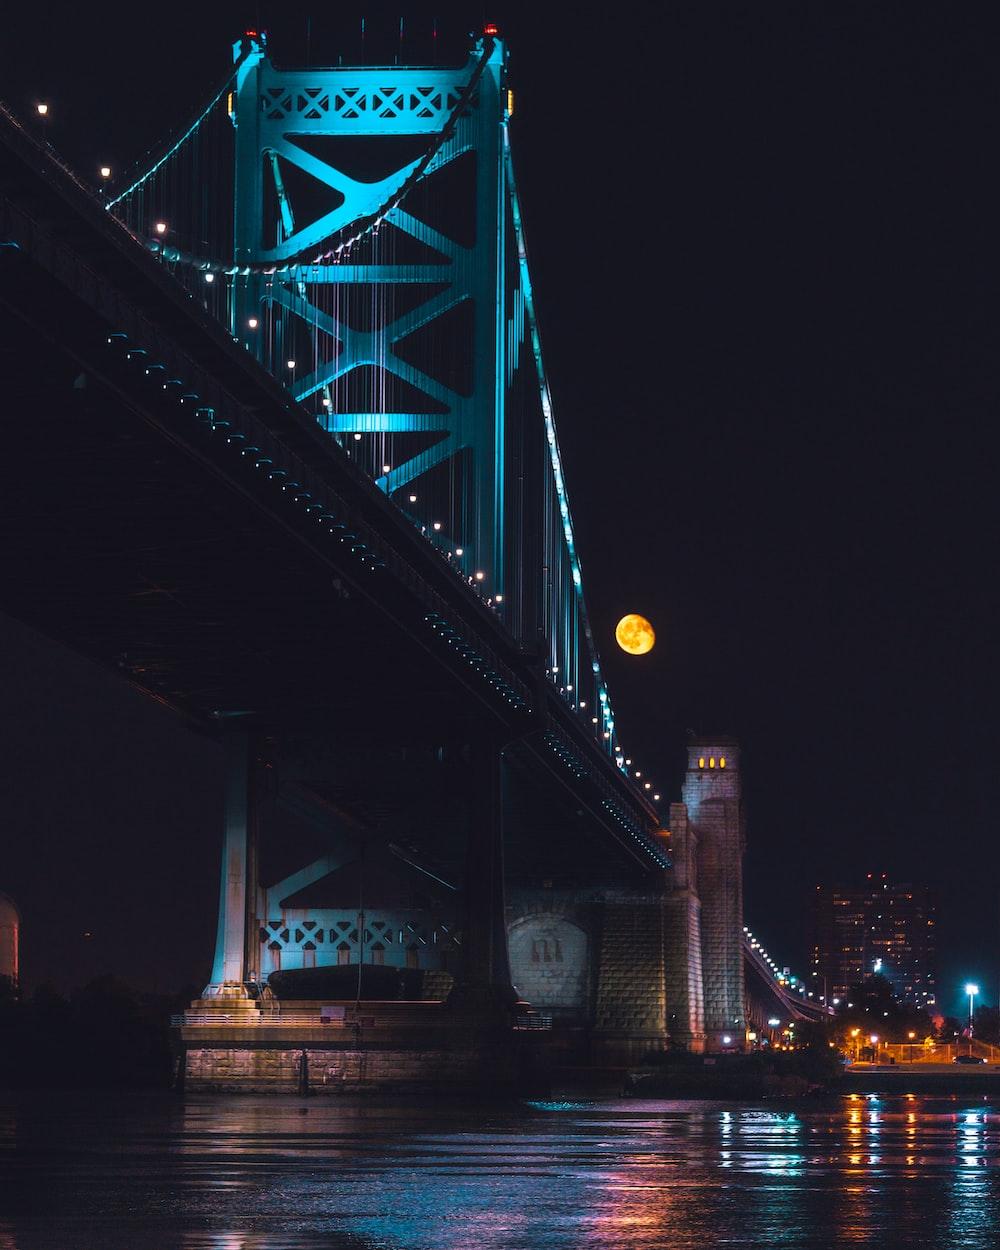 lighted bridge during night time